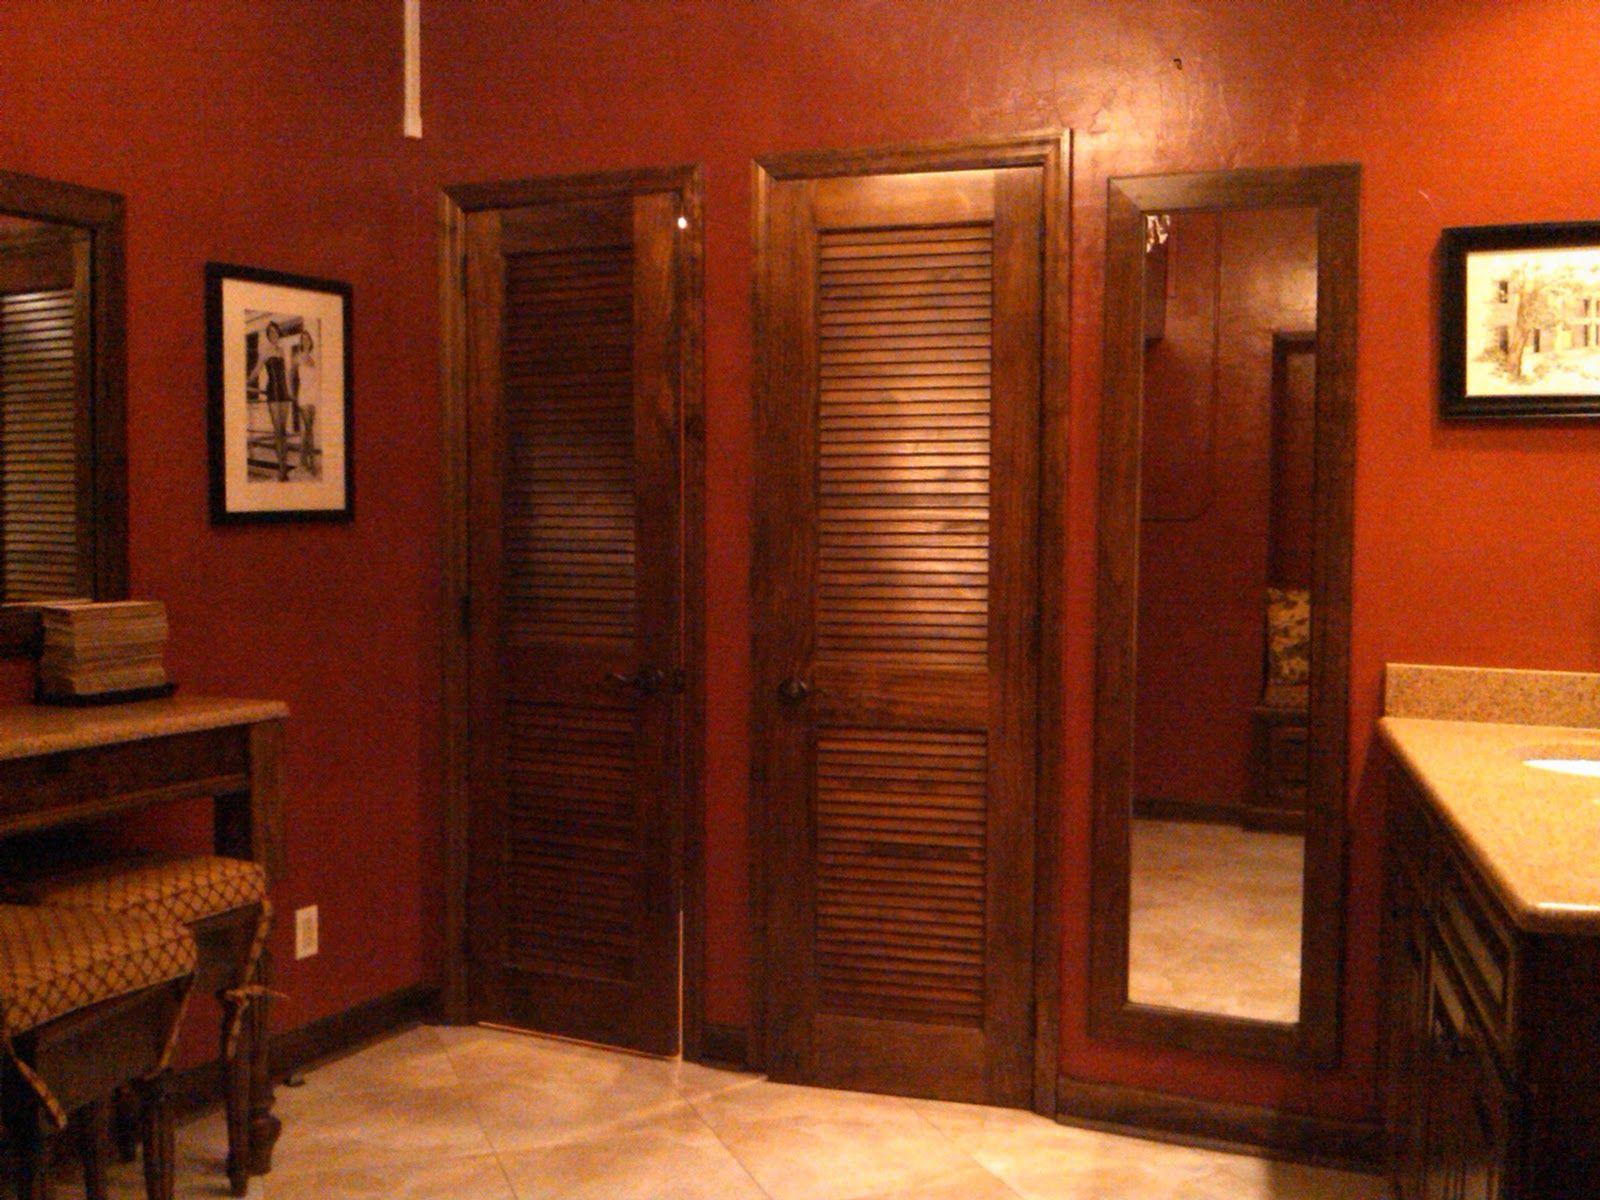 Bathroom Stall Doors  Ucc Interior Design  Pinterest  Bathroom Fair Bathroom Doors Design Review